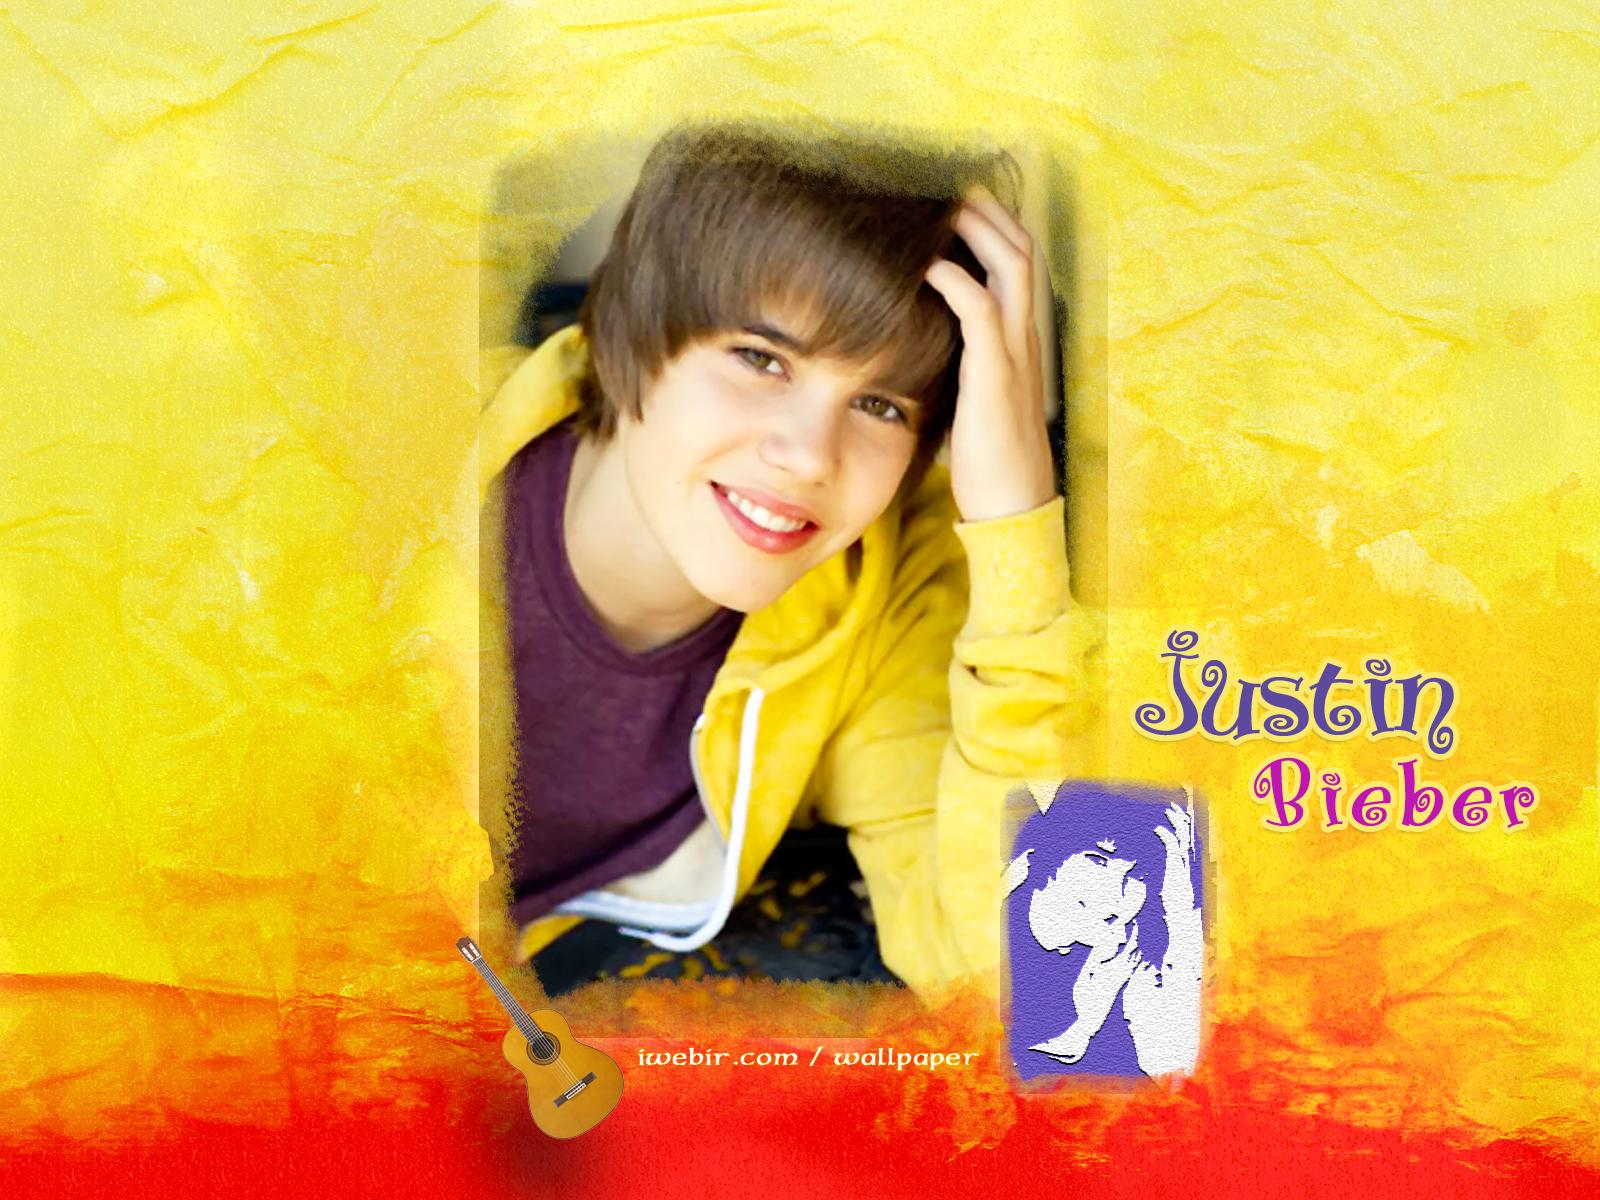 Justin Bieber Images Desktop Wallpaper 2010 HD High RES And Background Photos